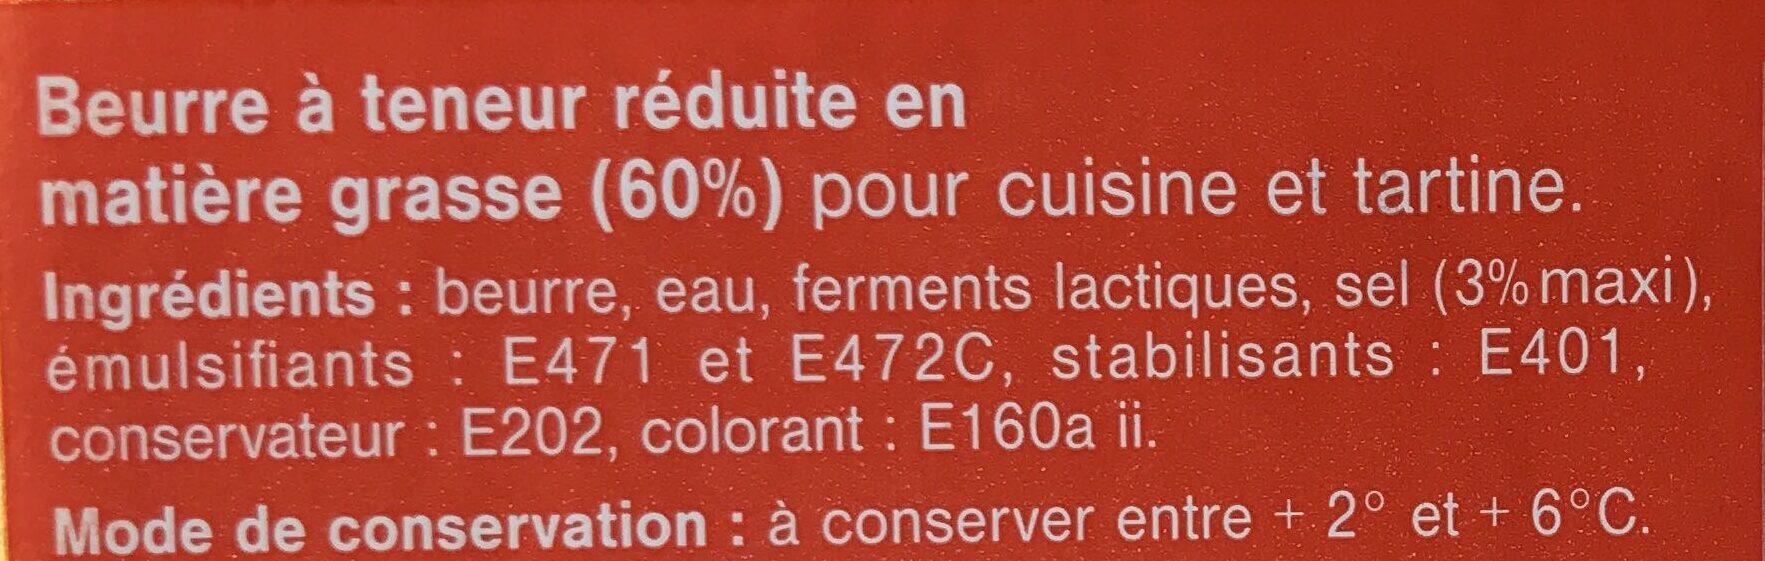 Cuisine et Tartine Demi-Sel - Ingrédients - fr